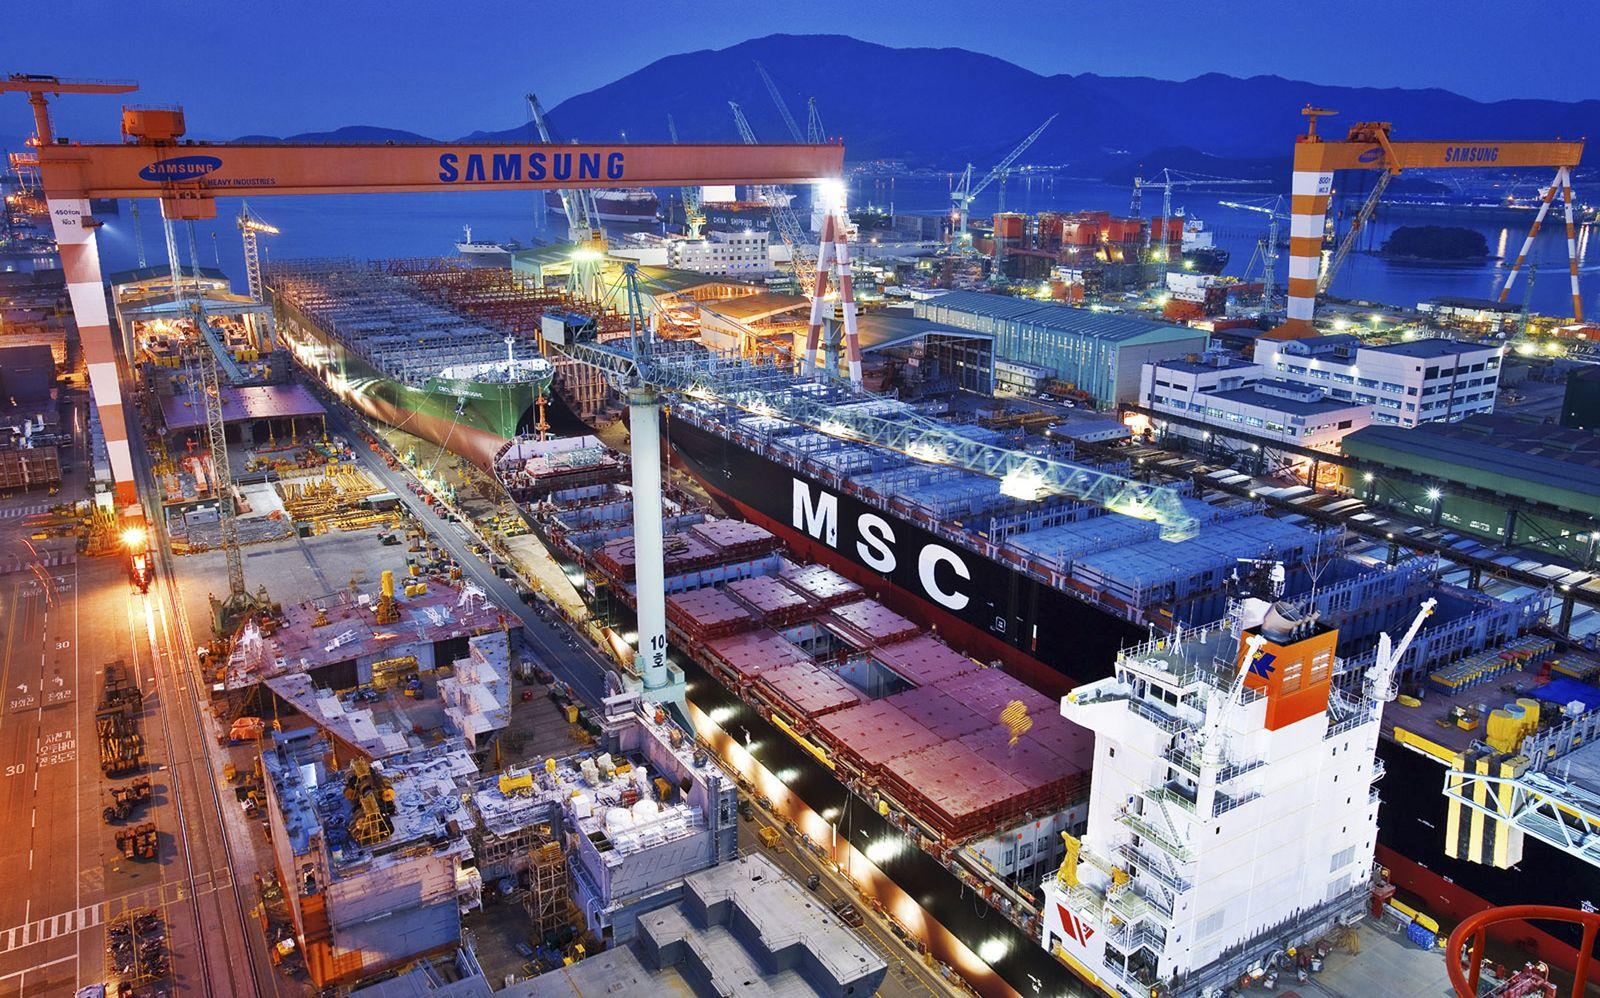 Samsung Heavy Industries / Shipyard